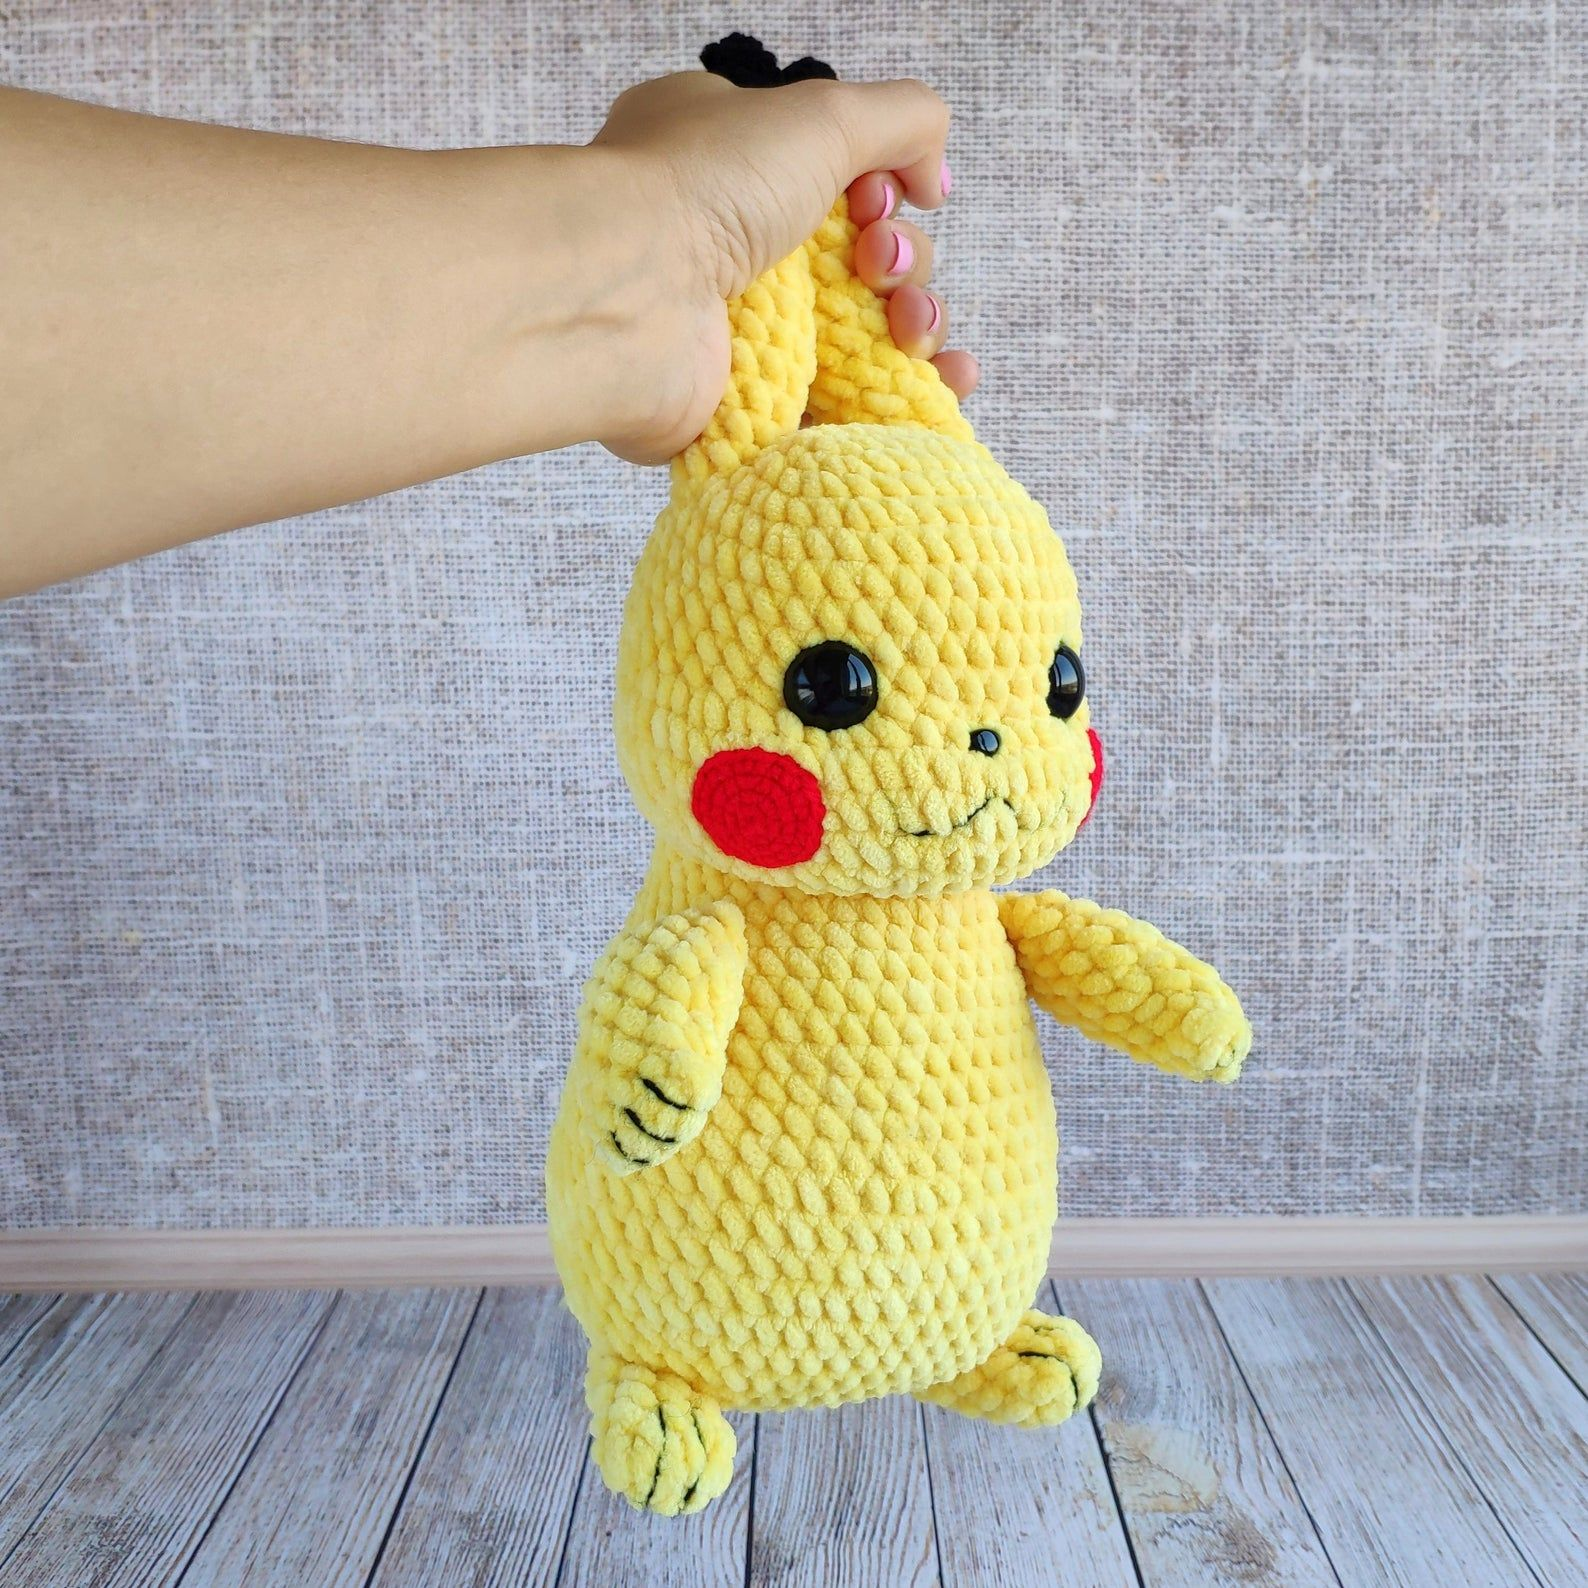 Pikachu detective toy pokemon new movie Pikachu amigurumi Pikachu detetive amigurumi pokemon amigurumi pokemon detective